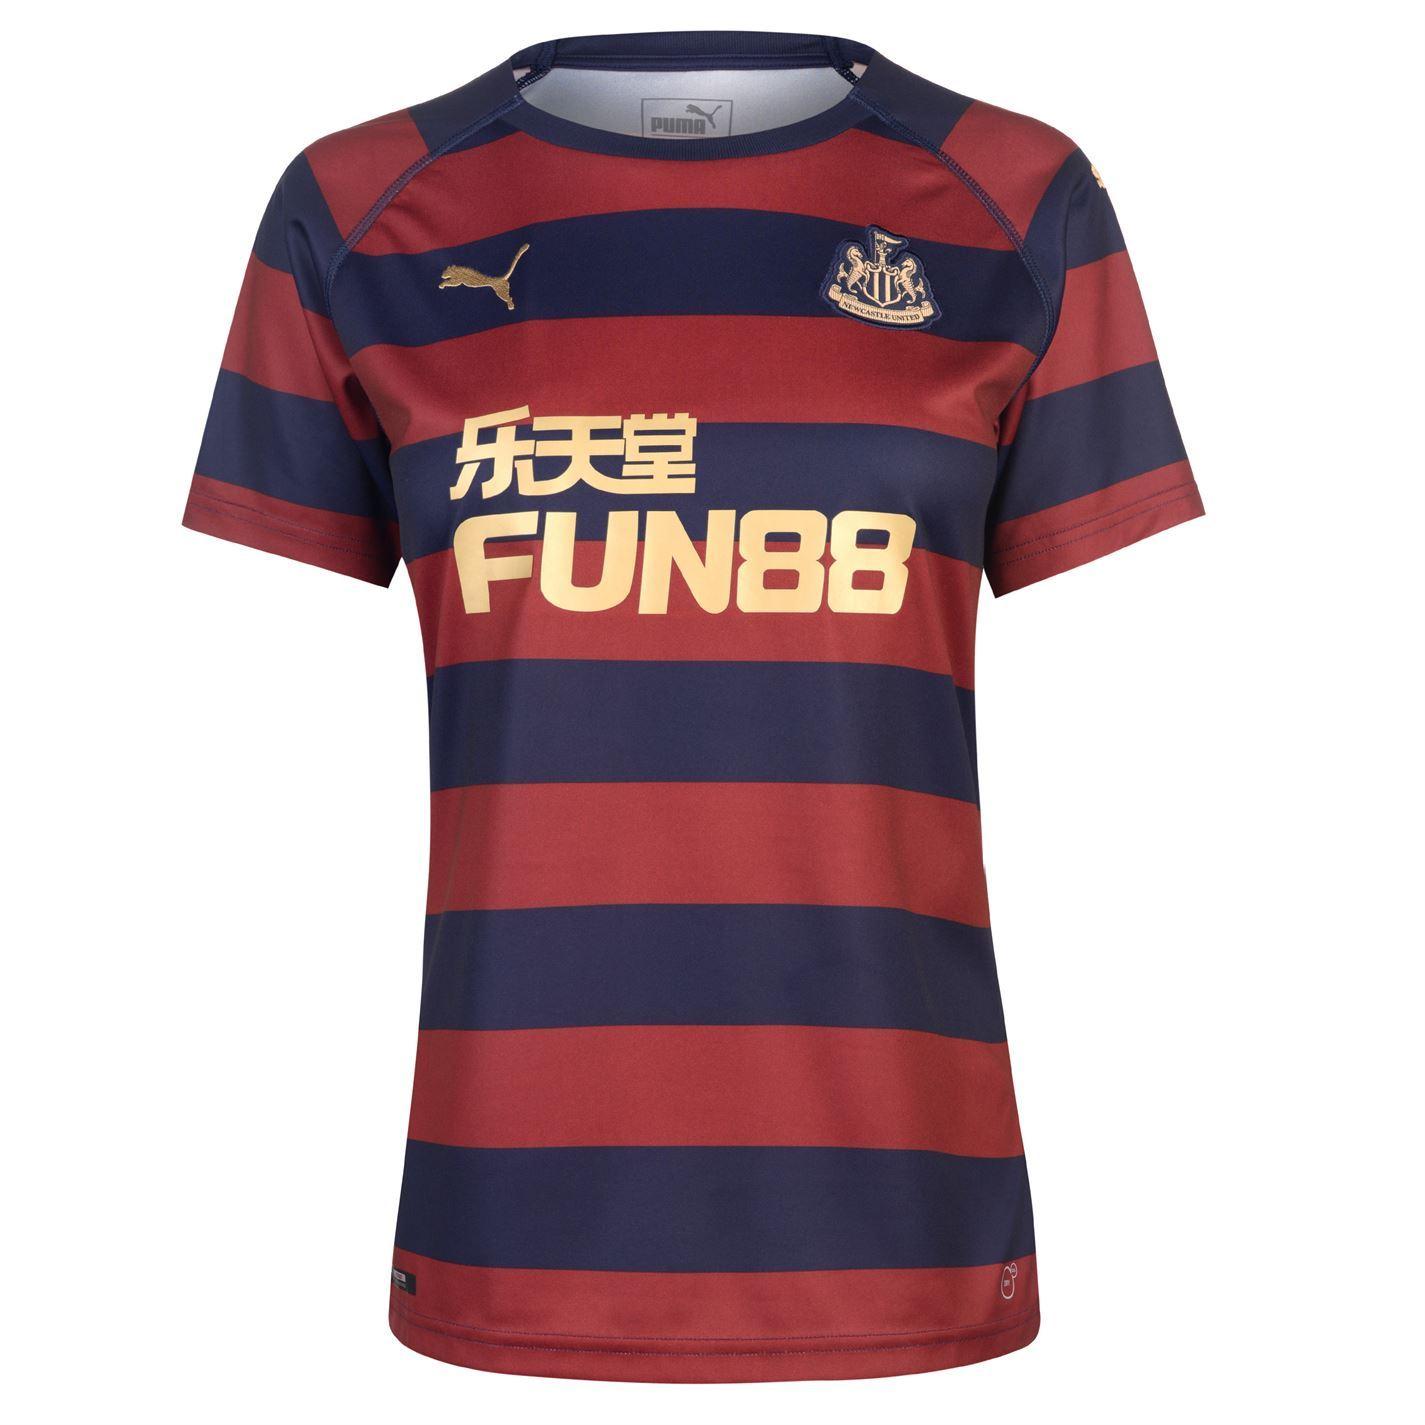 281171846ae ... Puma Newcastle United Away Jersey 2018 19 Womens Navy Football Soccer  Shirt Top ...